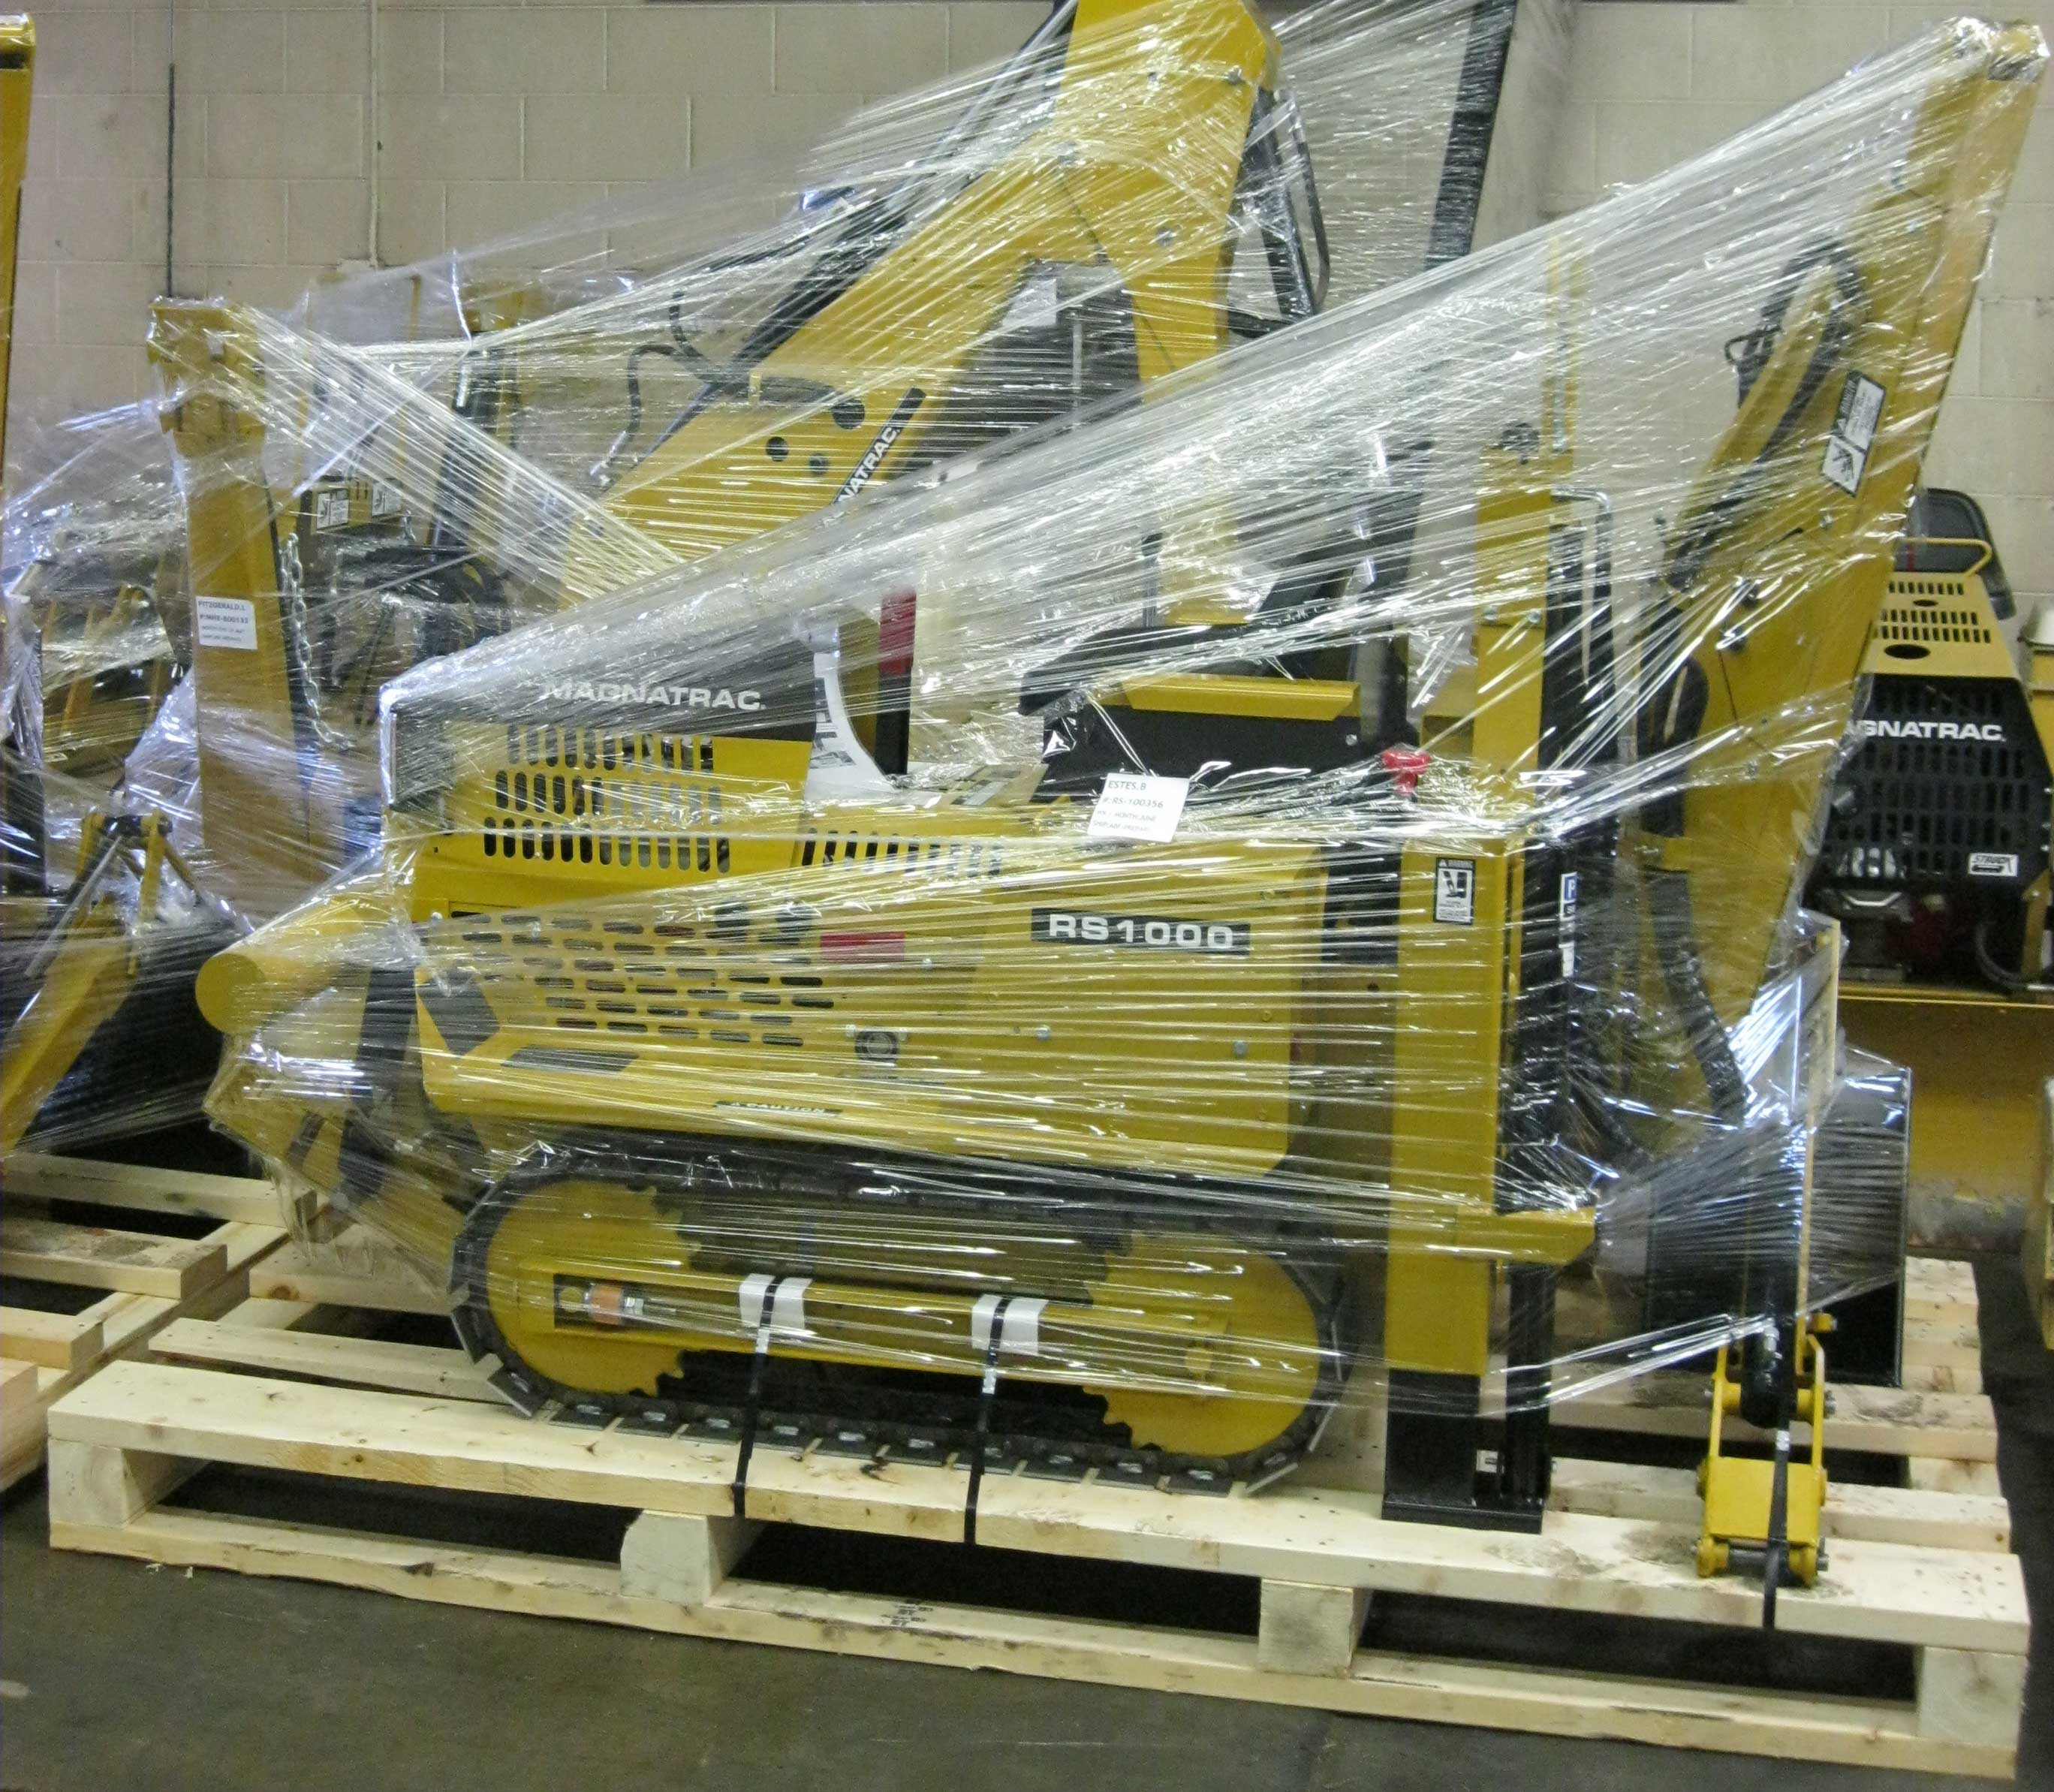 How Do You Ship a MAGNATRAC RS1000? - Struck Corp